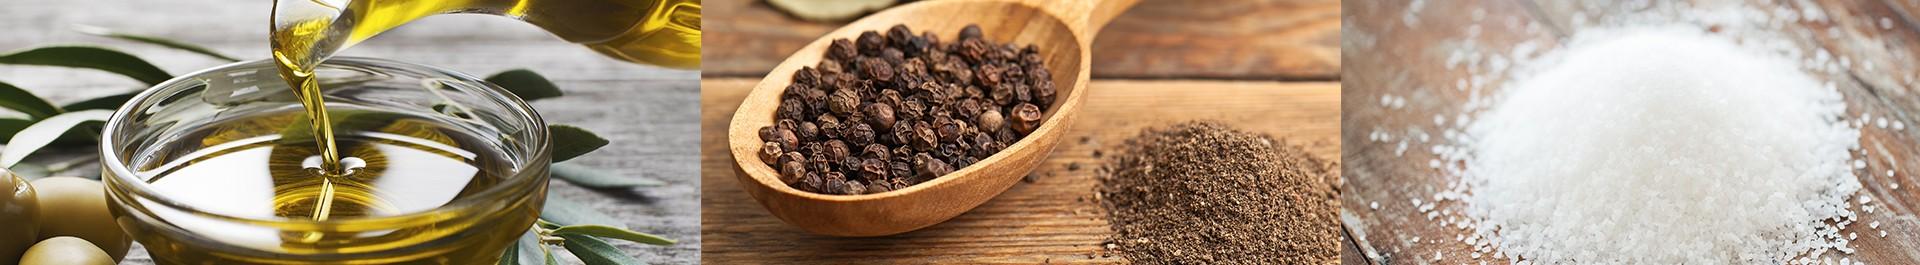 salt and pepper seeds ingredients